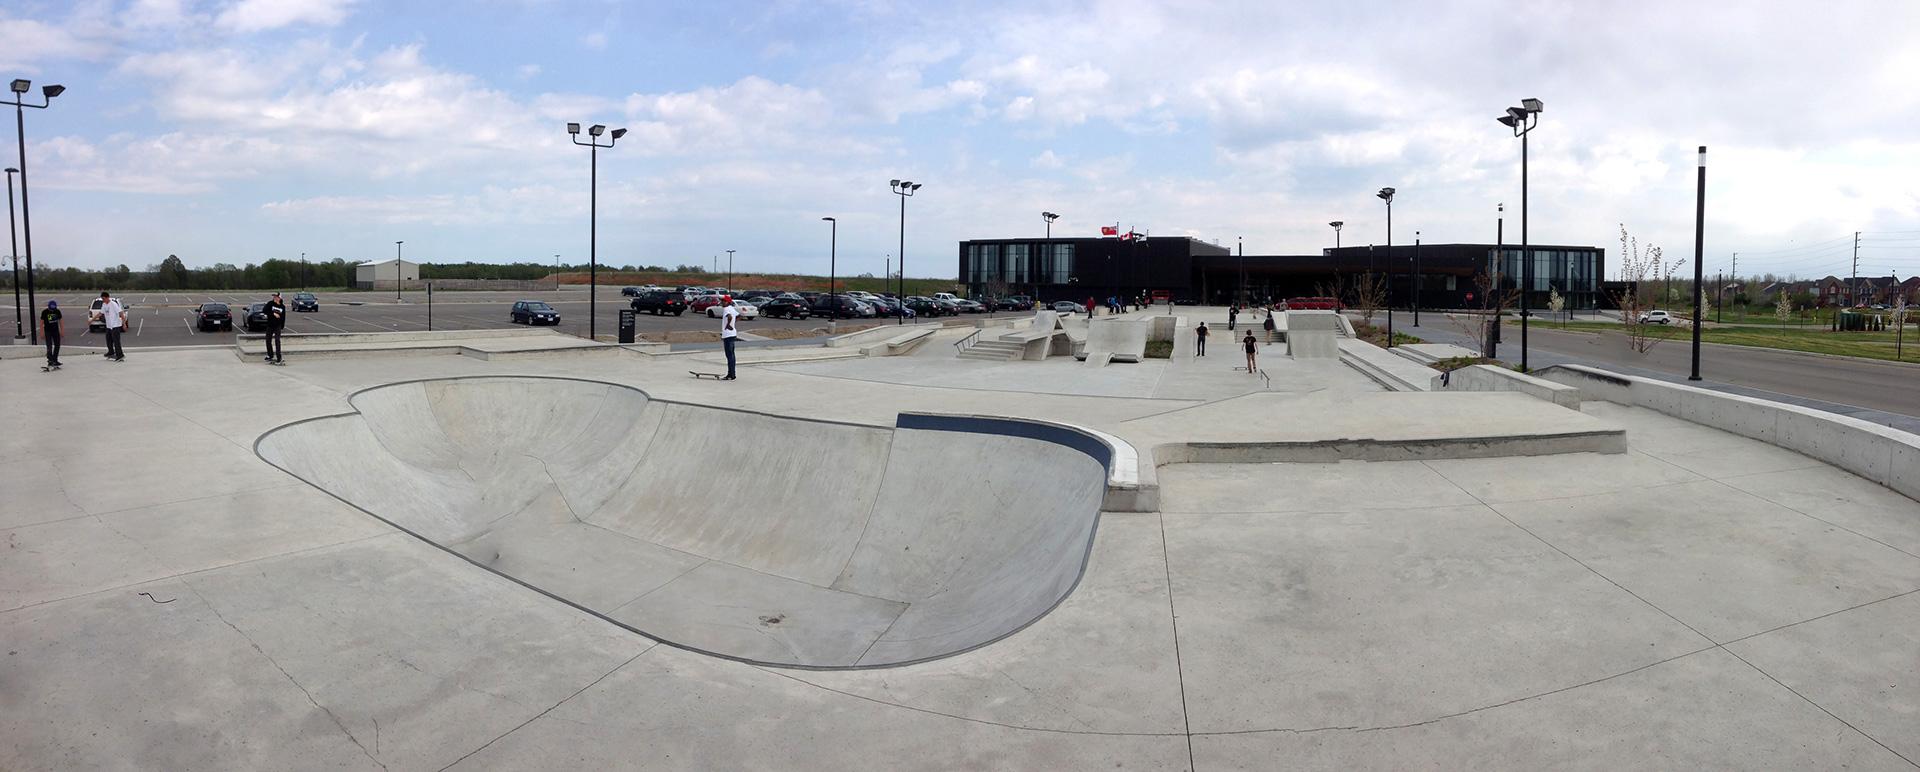 ajax skatepark from near the bowl